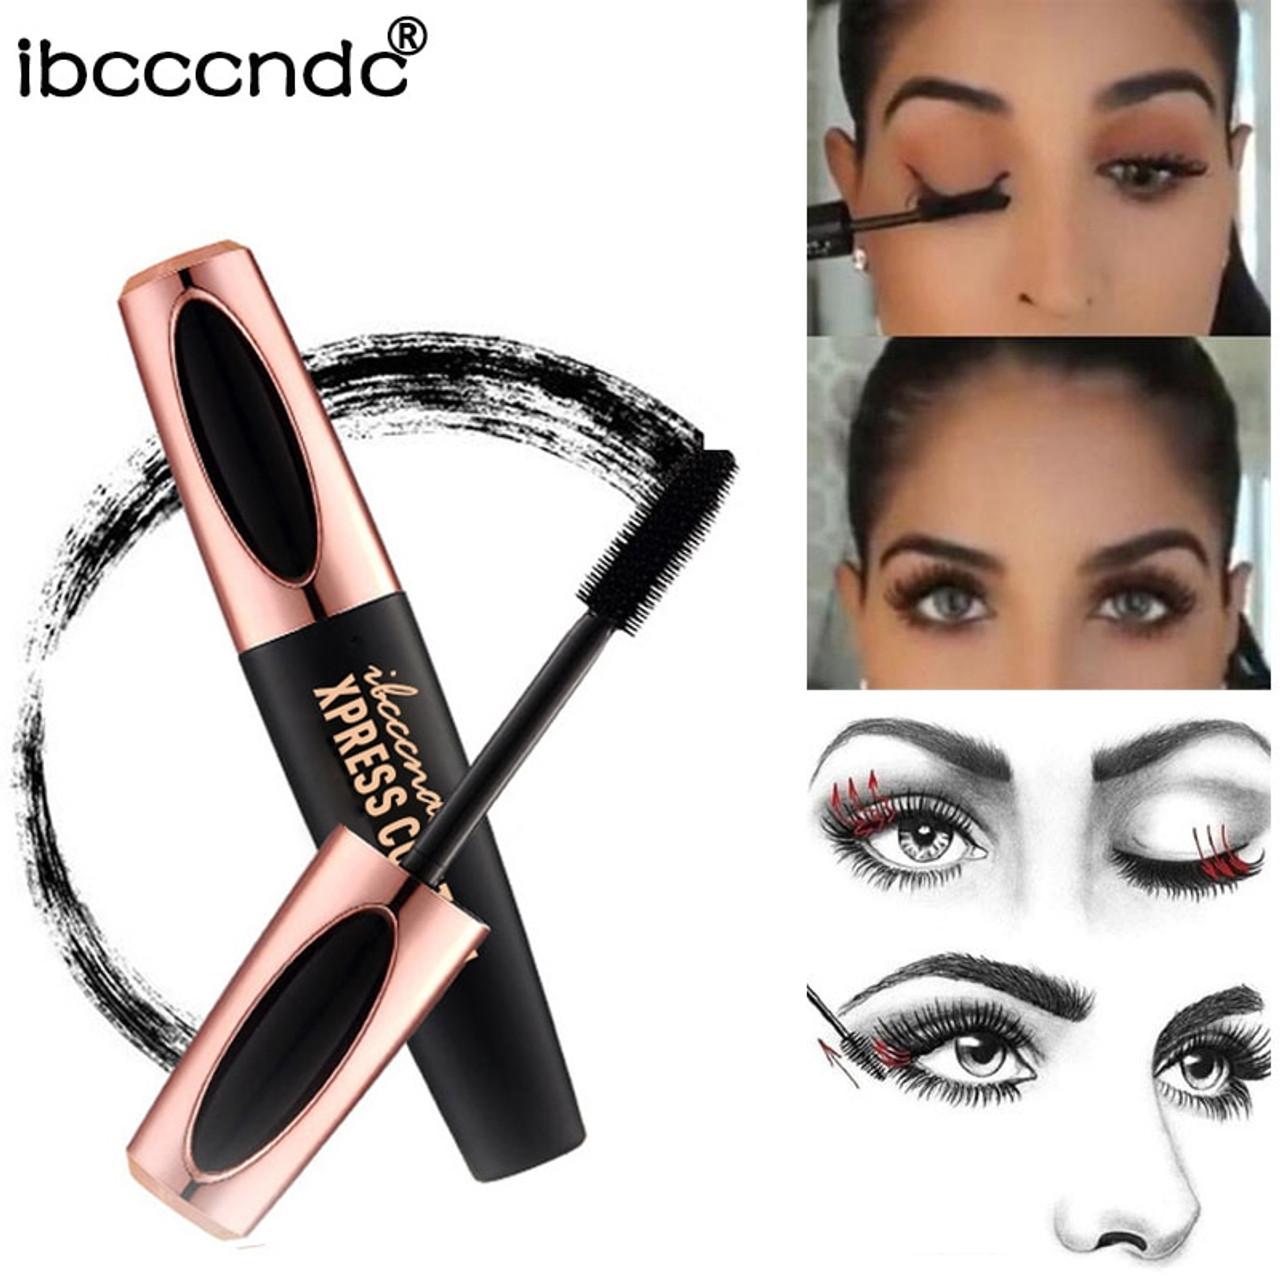 f6611e7df50 ... New 4D Silk Fiber Lash Mascara Waterproof Rimel 3d Mascara For Eyelash  Extension Black Thick Lengthening ...